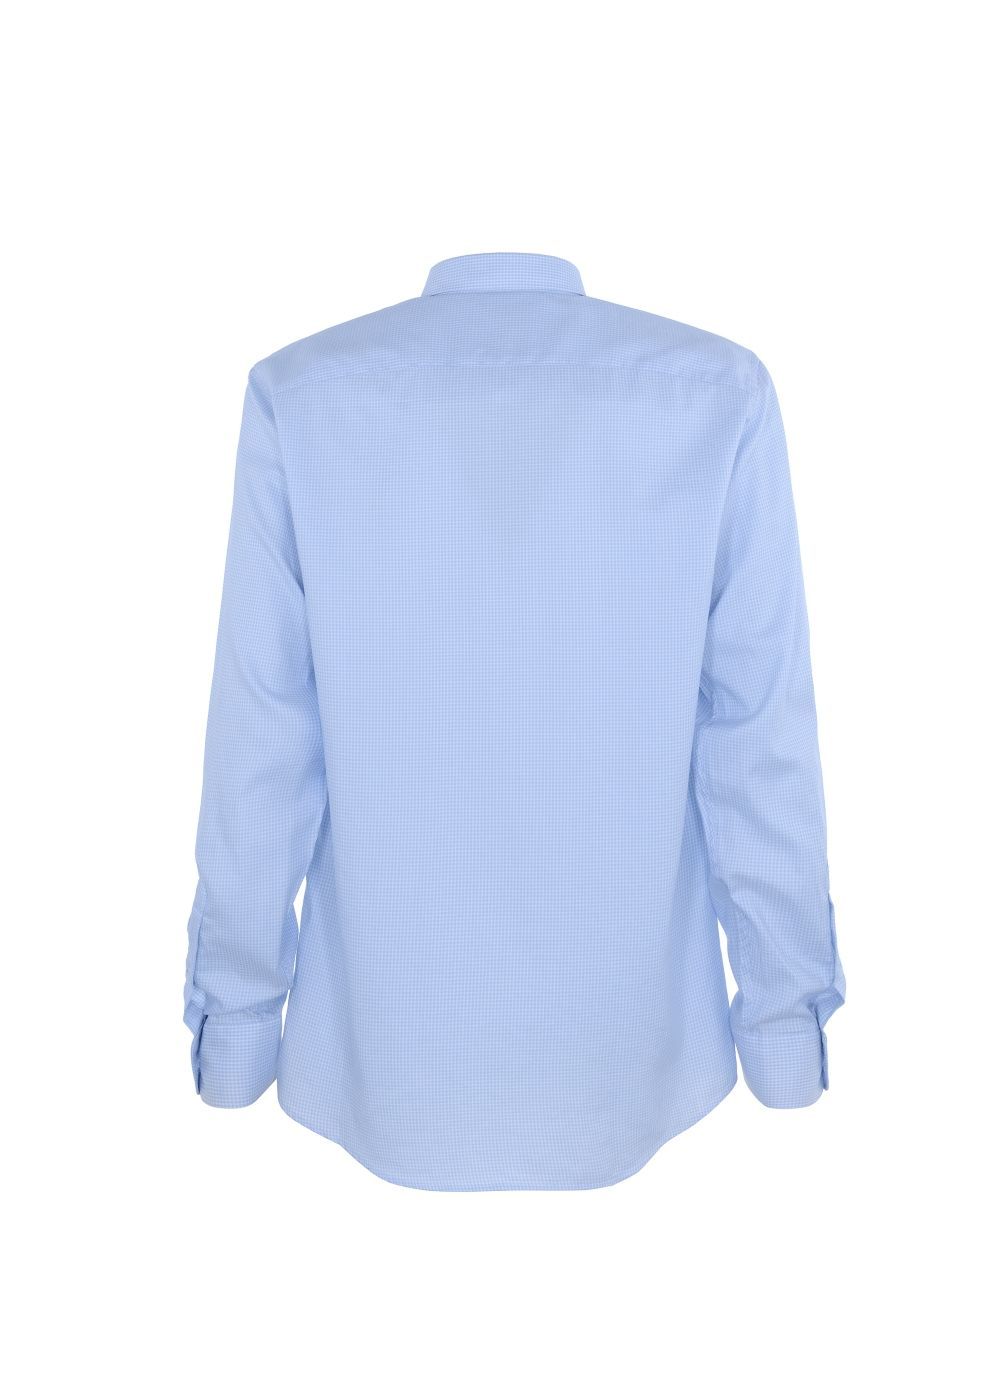 Koszula męska KOSMT-0103-61(W19)